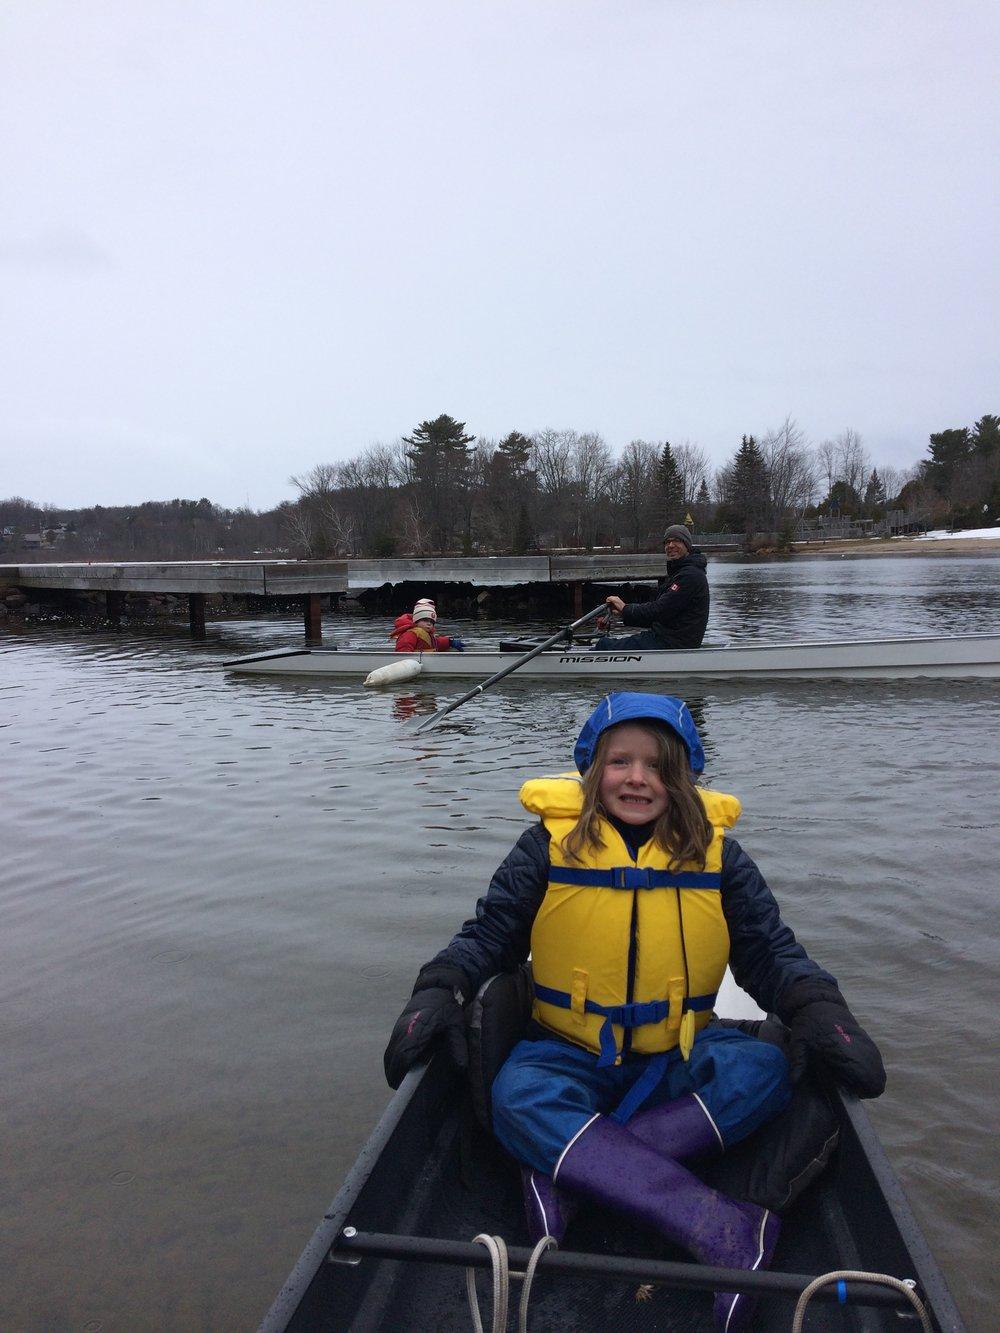 Spring Rowing in Muskoka